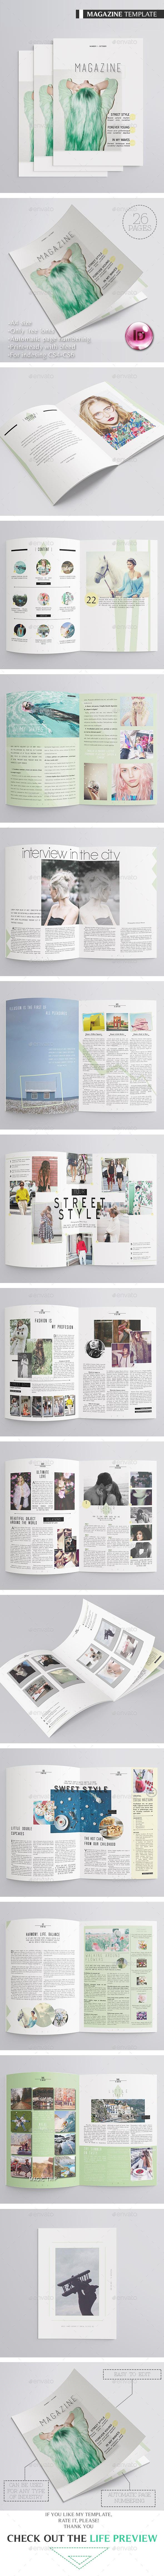 Multipurpose Magazine 26 Pages - Magazines Print Templates